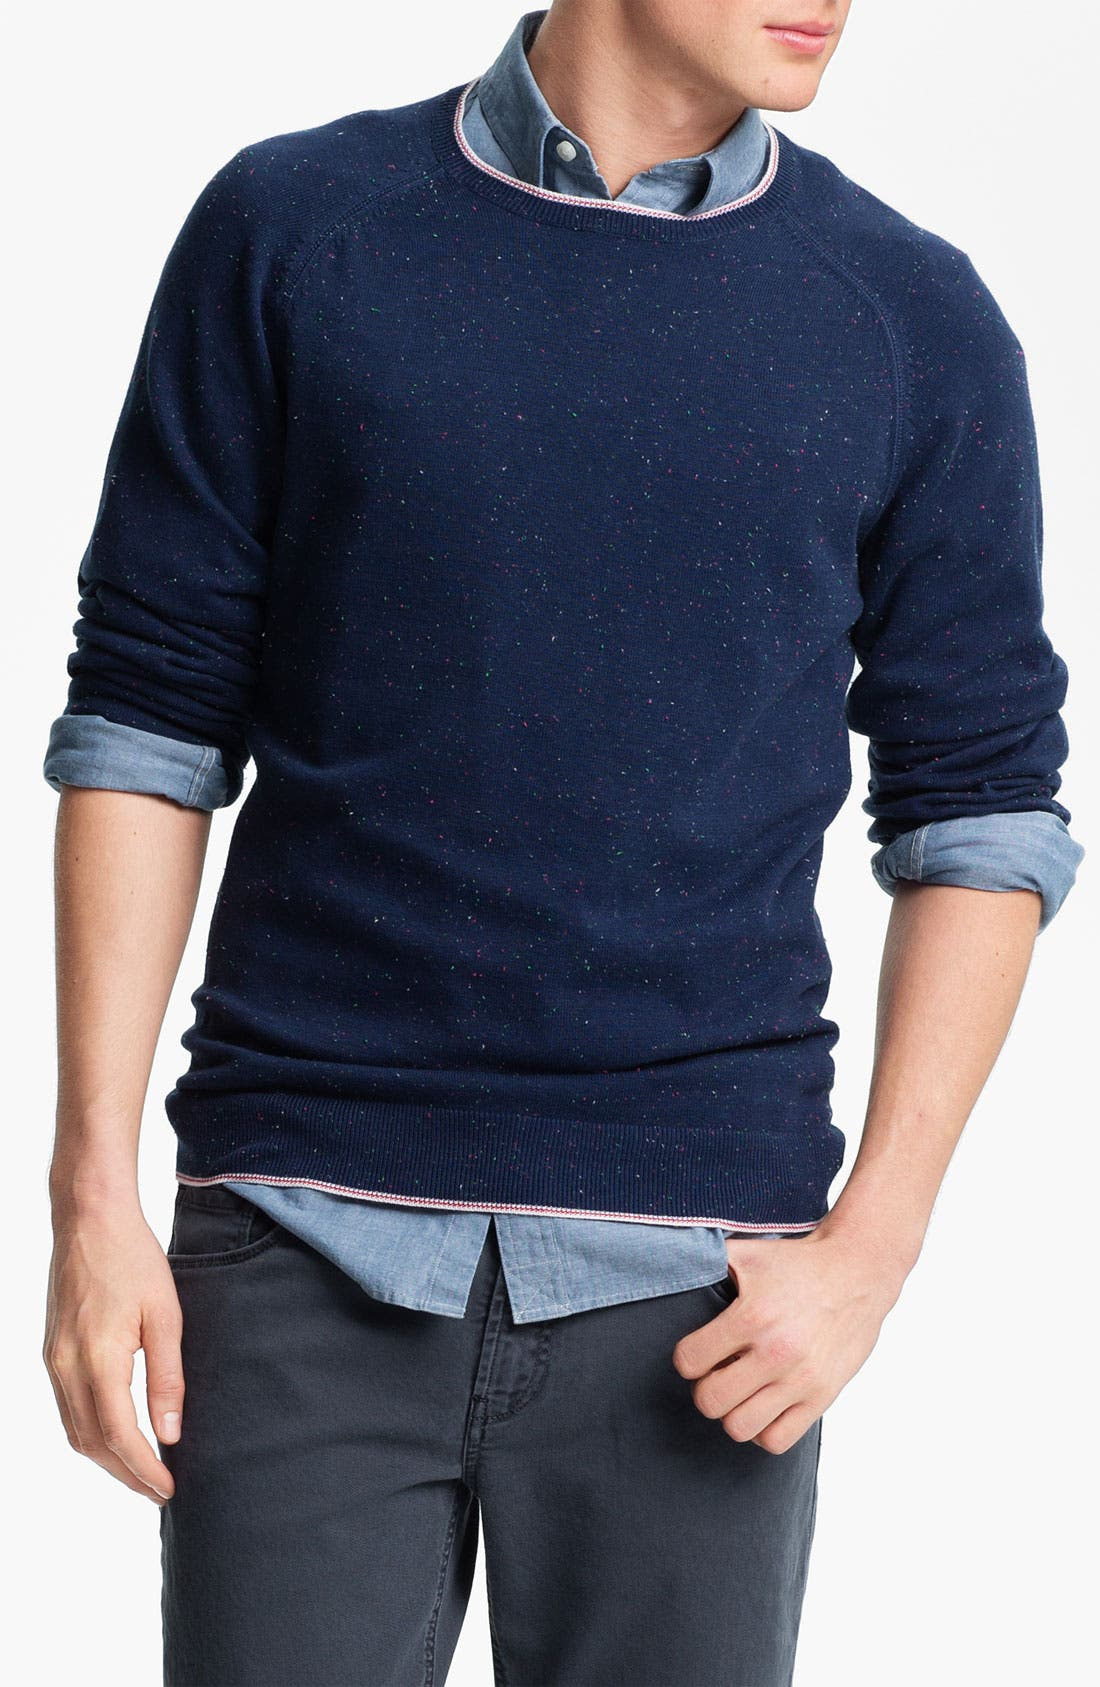 Alternate Image 1 Selected - Agave 'Abeam' Crewneck Sweater